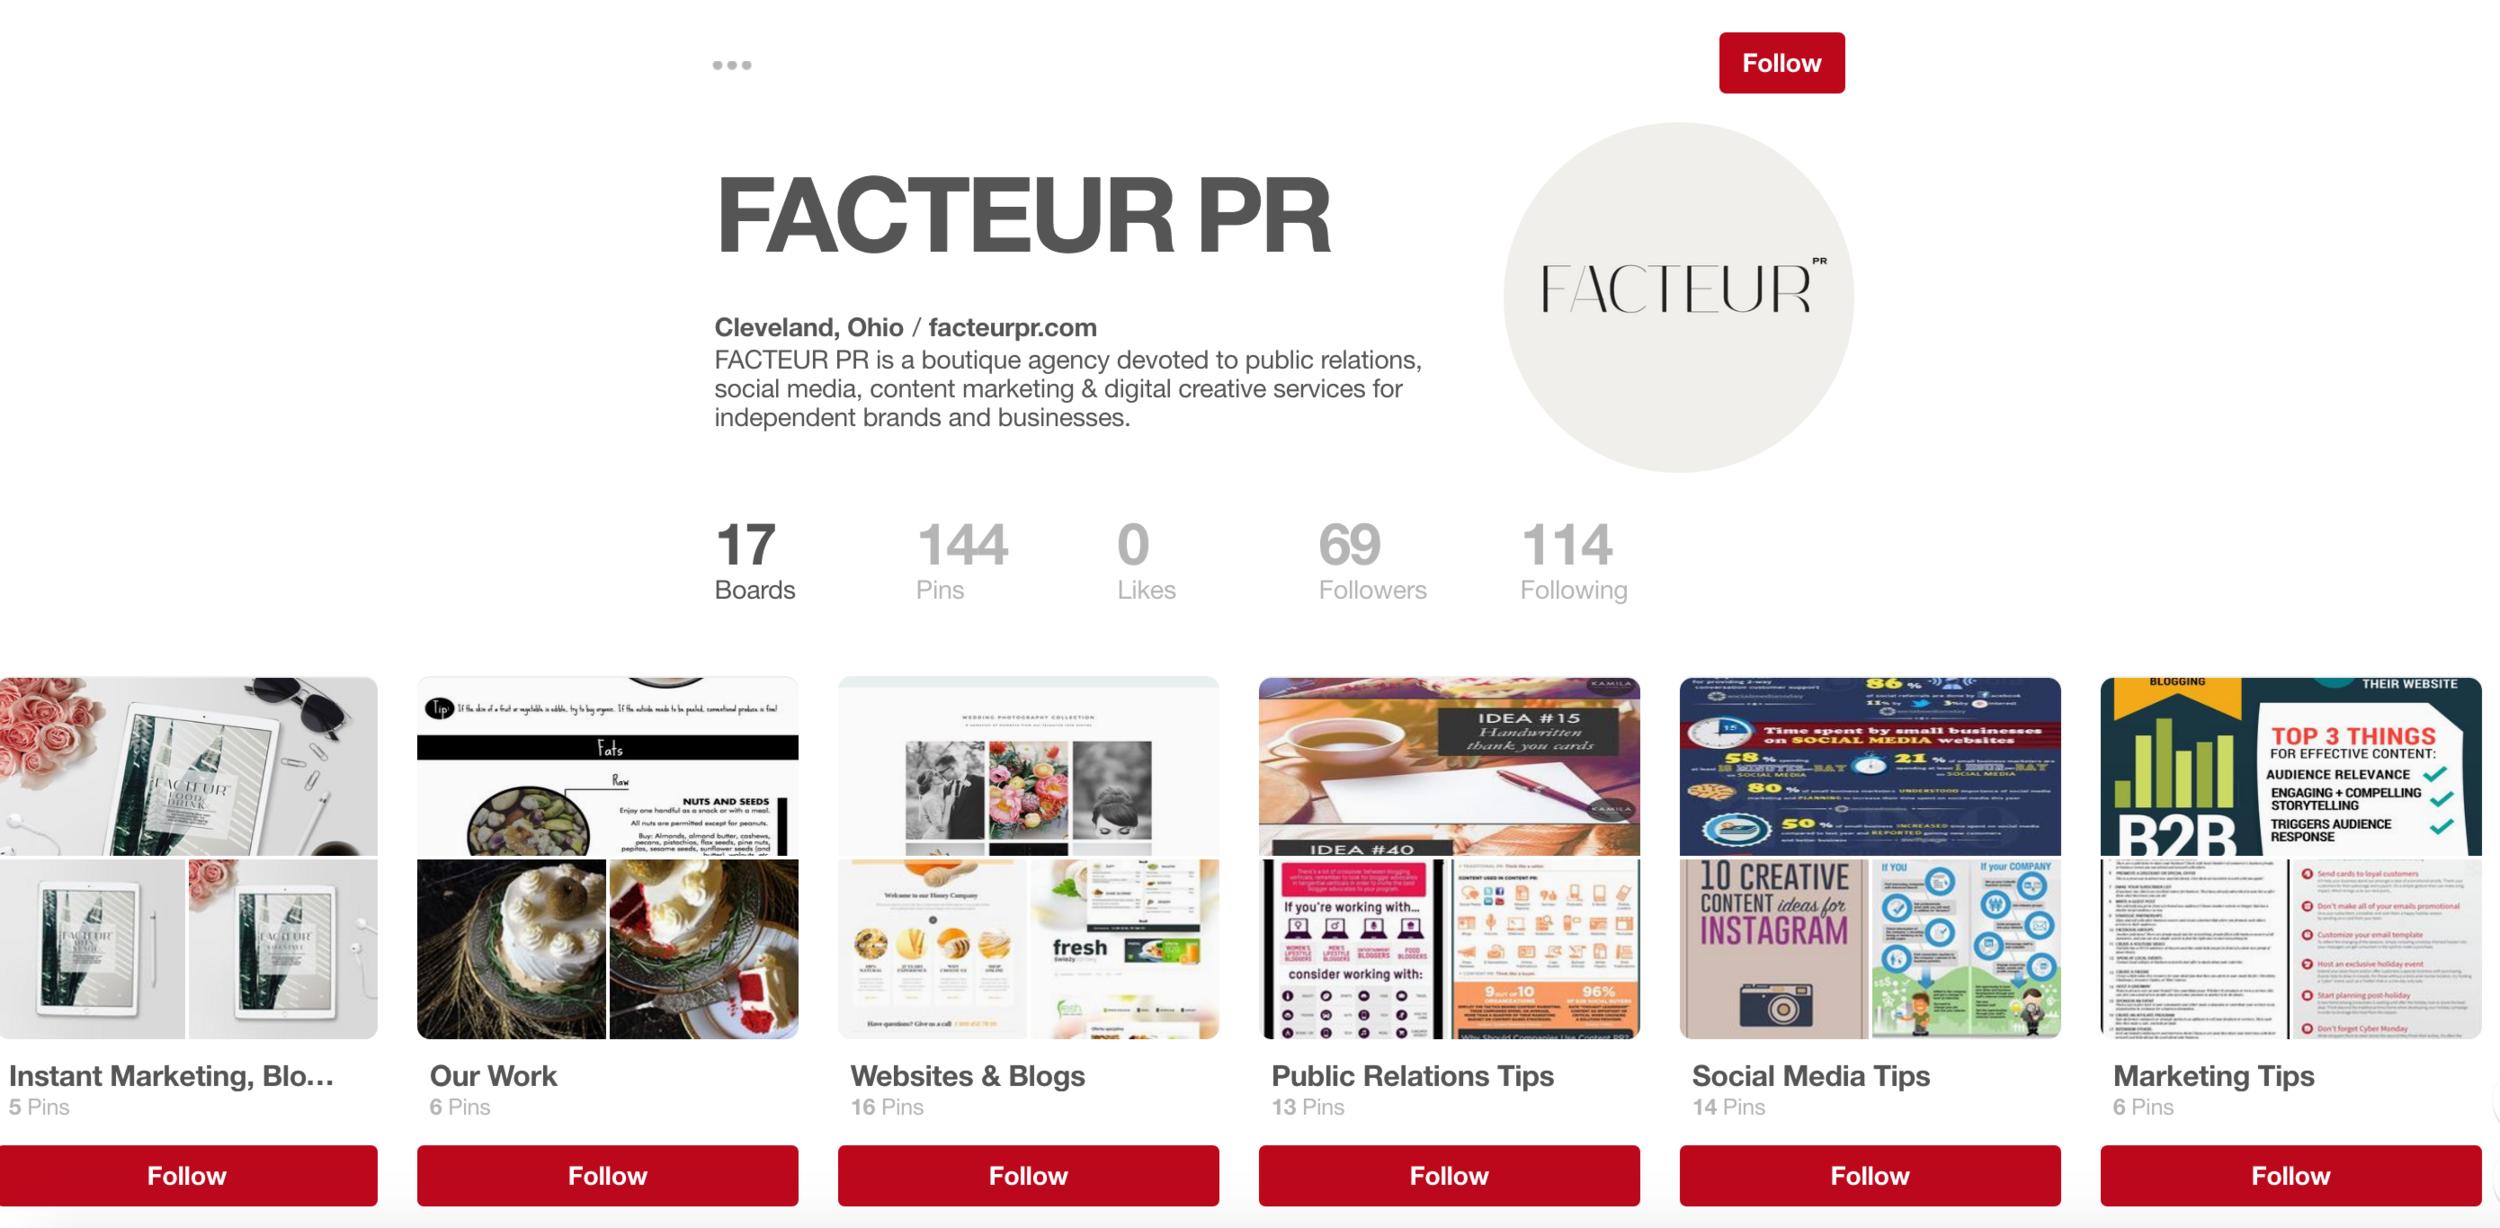 Follow FACTEUR PR ON pinterest for more social media, marketing, and pr tips!